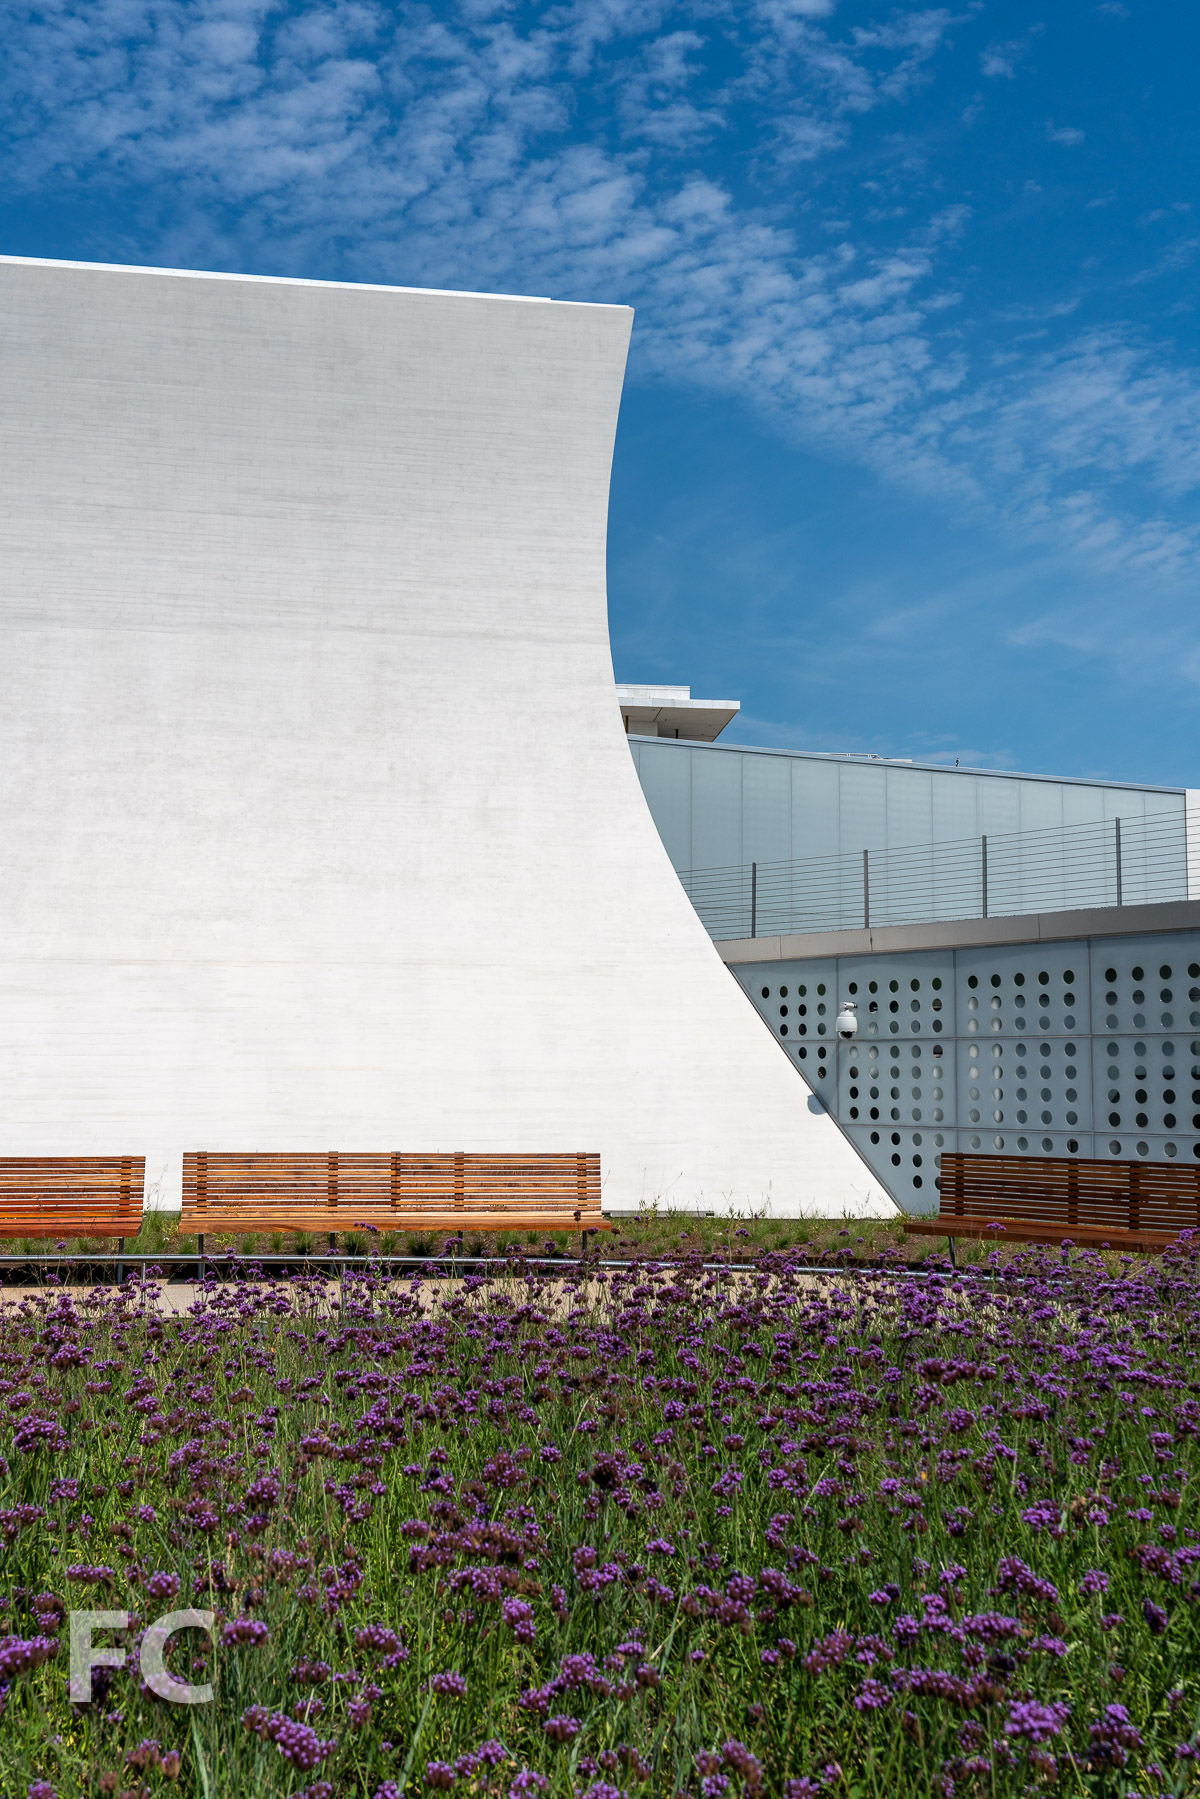 20190831-The Reach at Kennedy Center-DSC04967.jpg